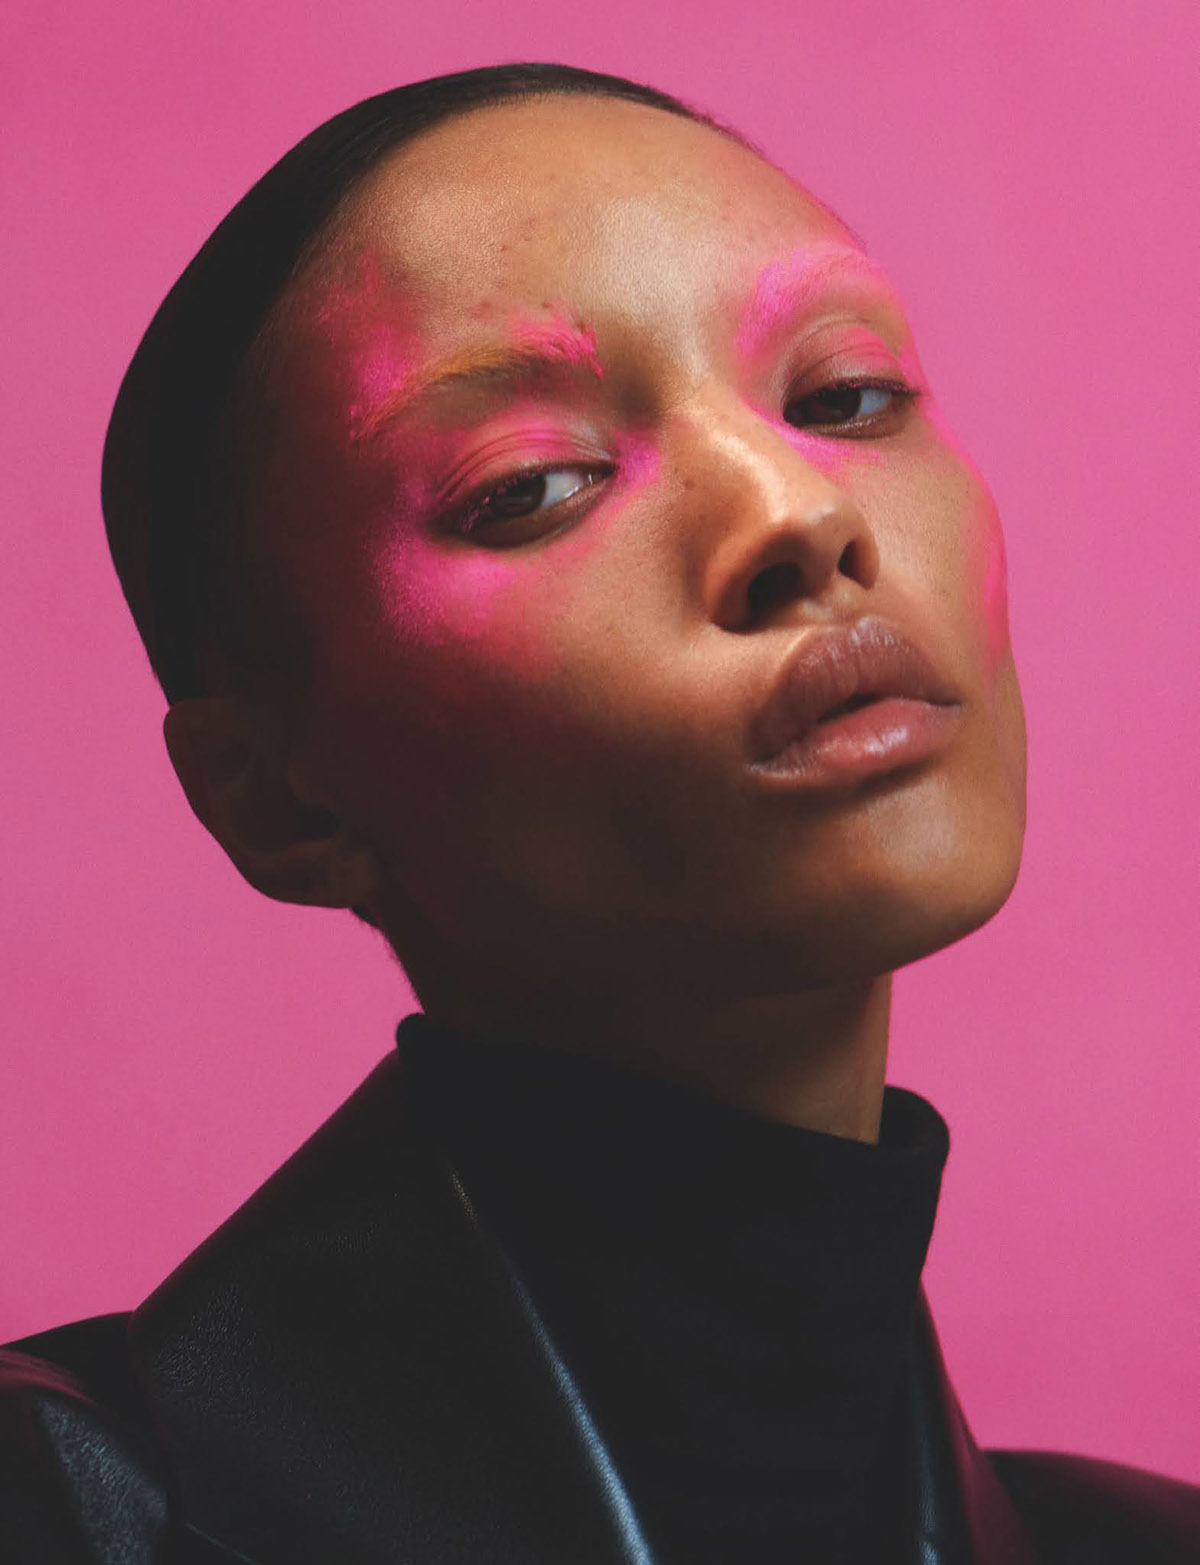 Georgia Palmer by Hanna Moon for British Vogue August 2021